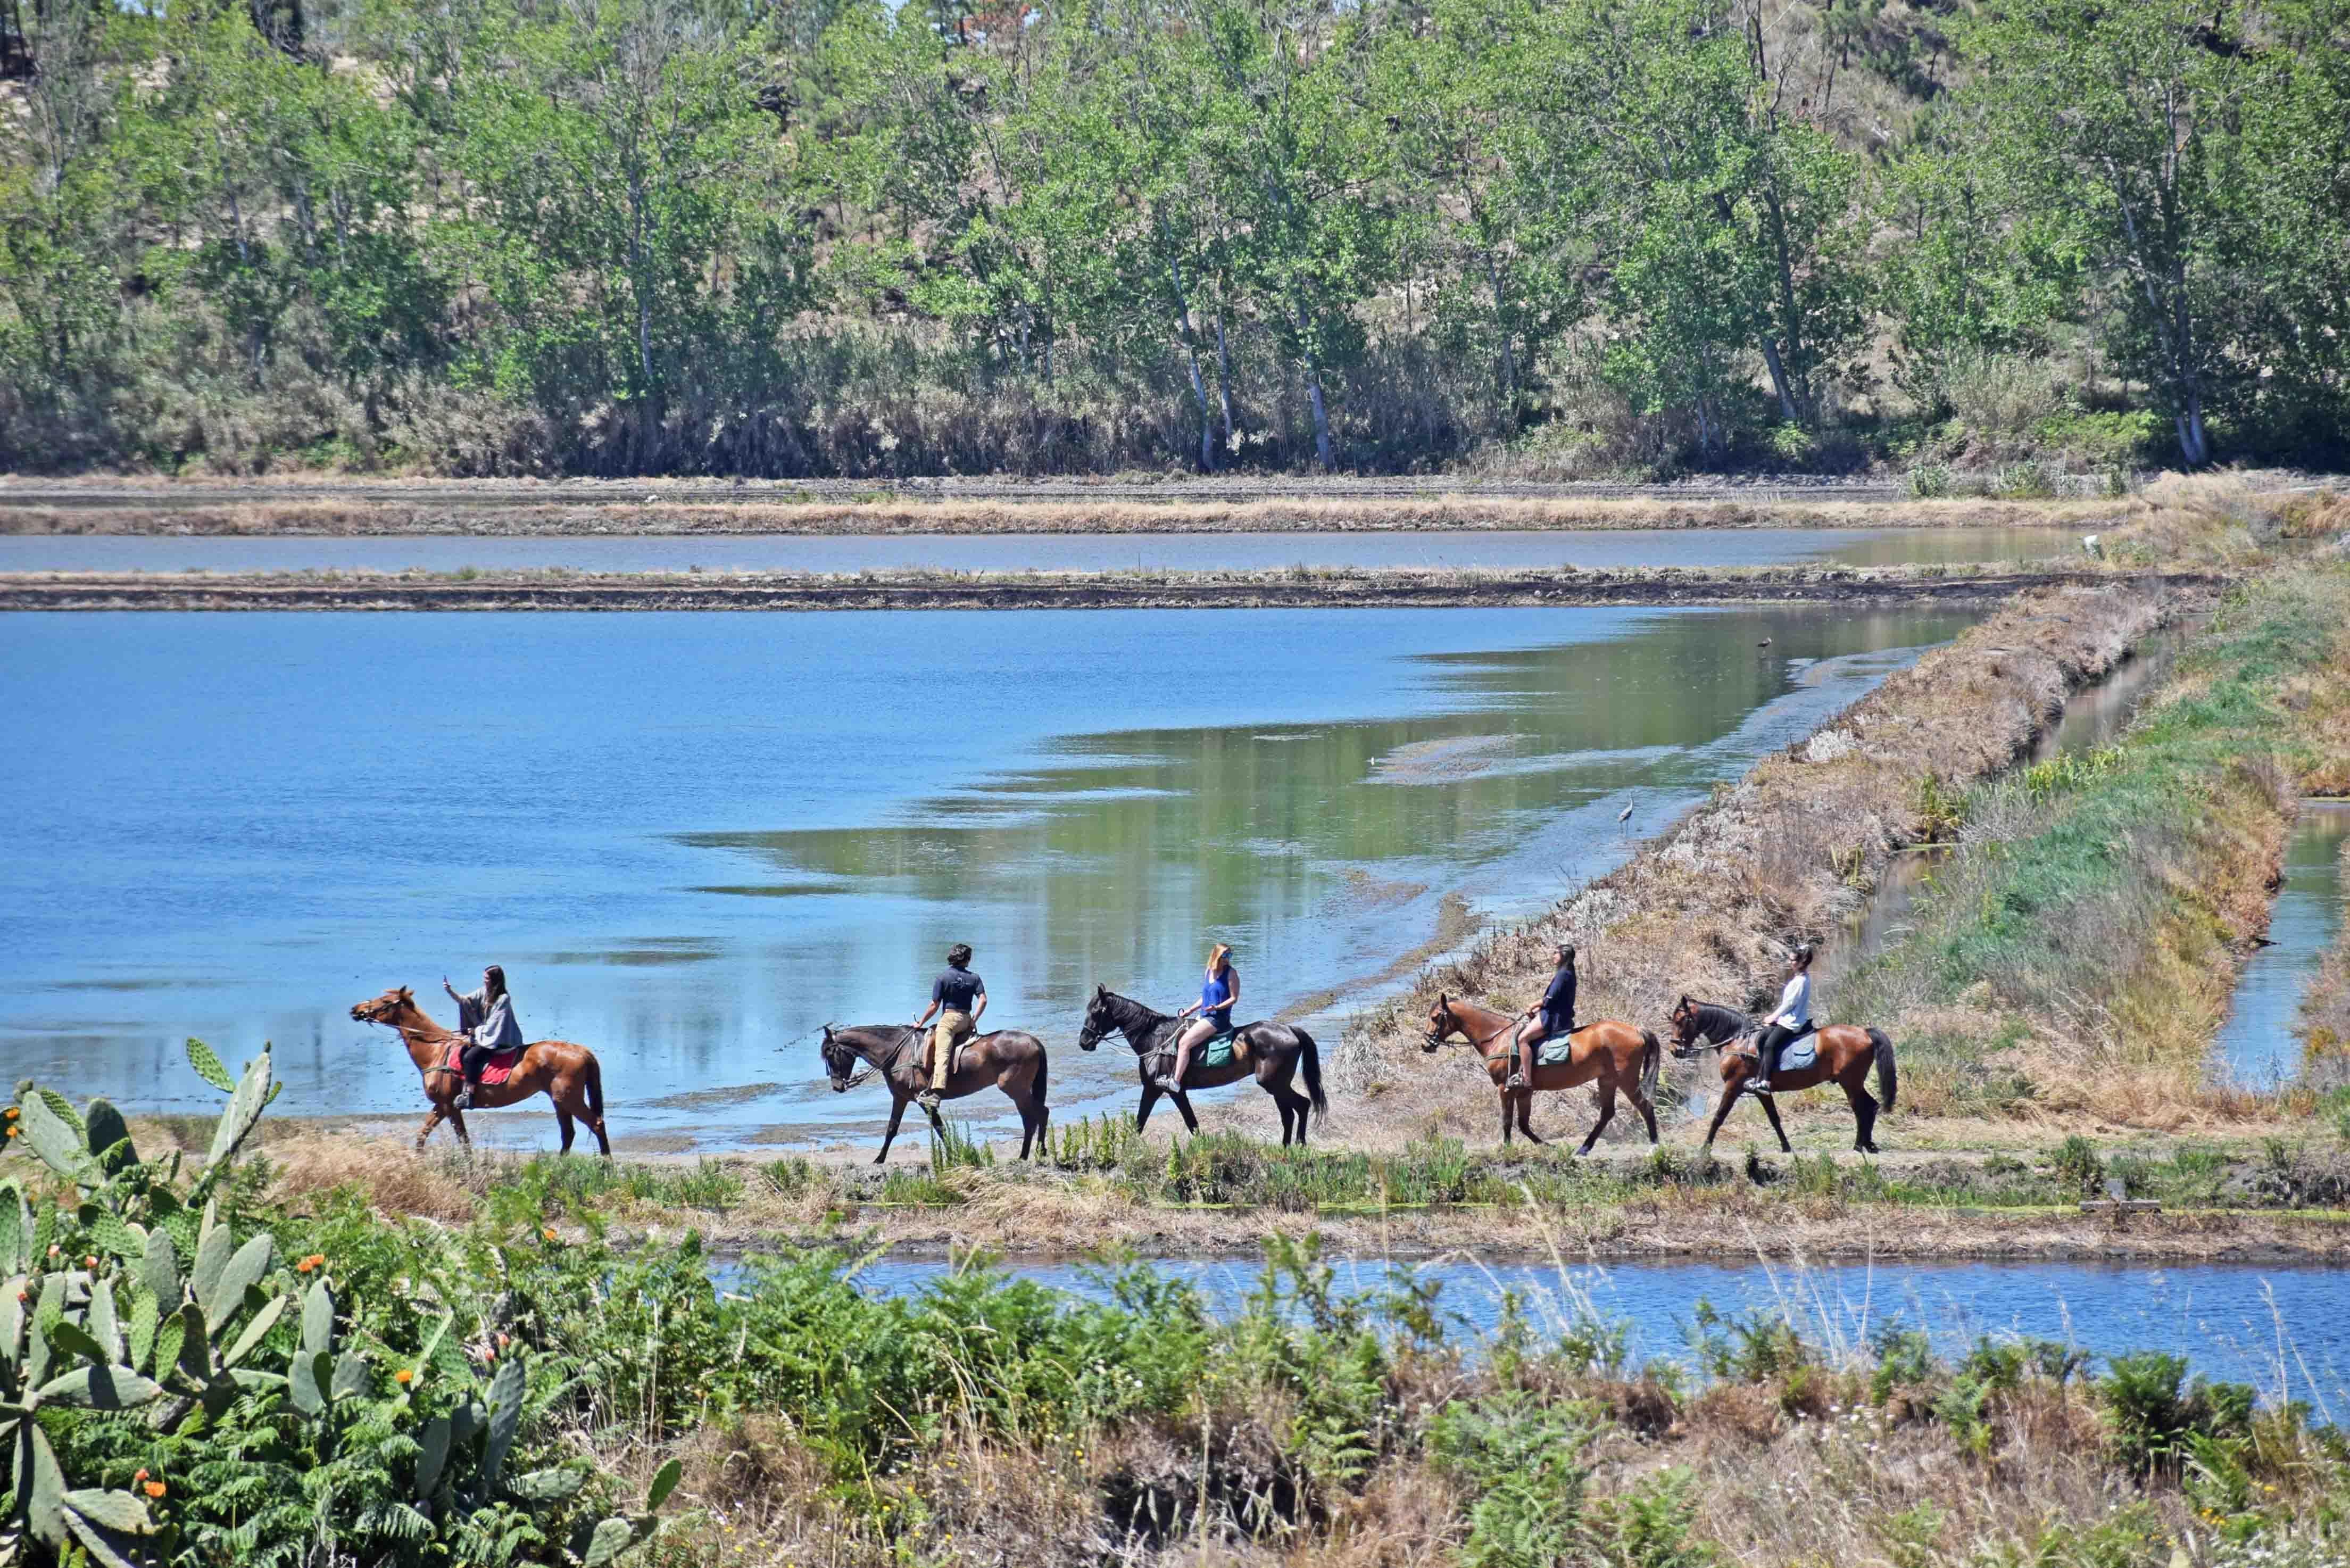 Cavalos na Areia - Comporta - Portugal